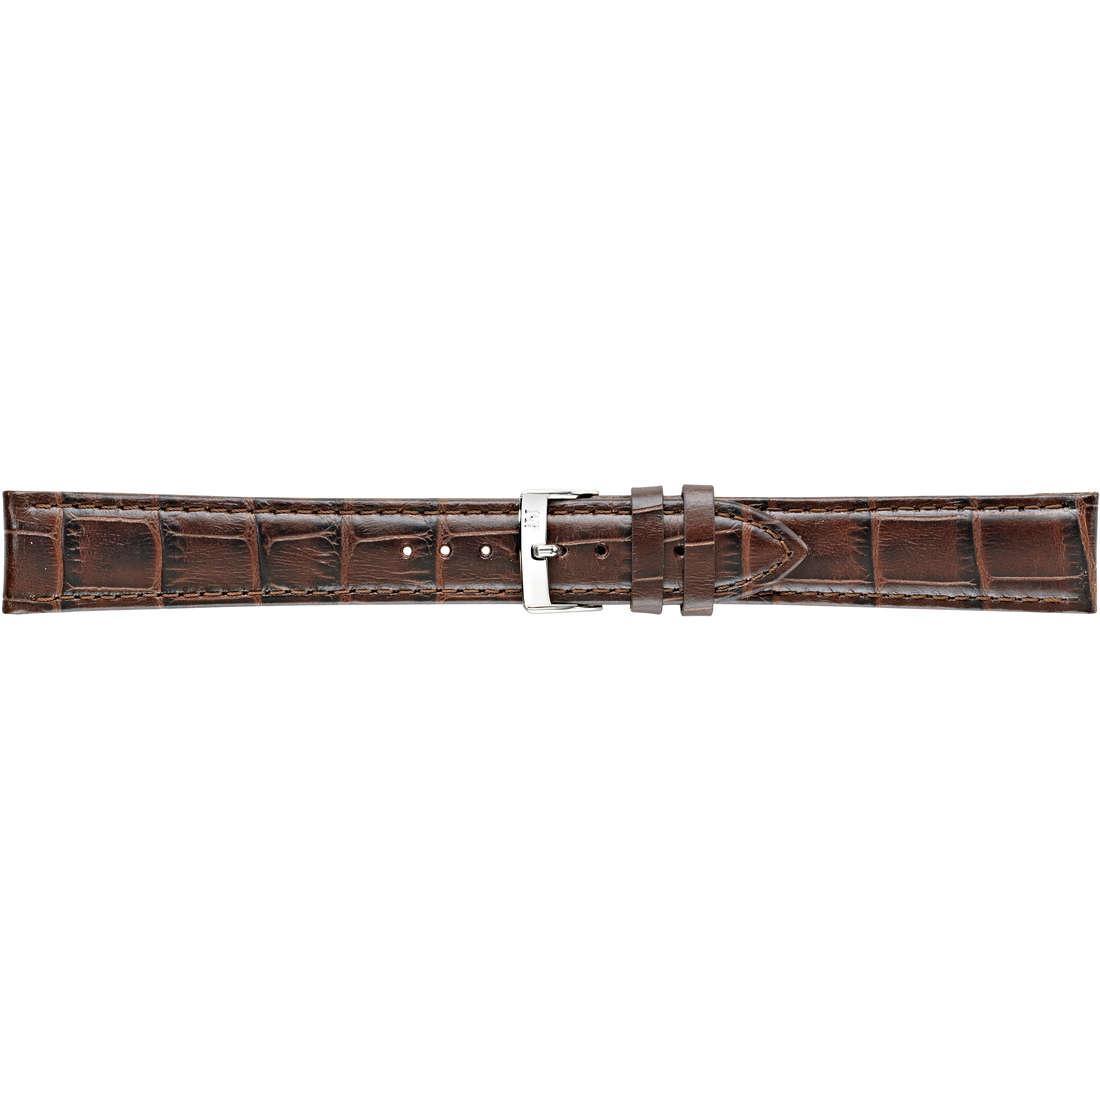 montre bande de montres unisex Morellato I Lunghi A01Y2269480032CR20